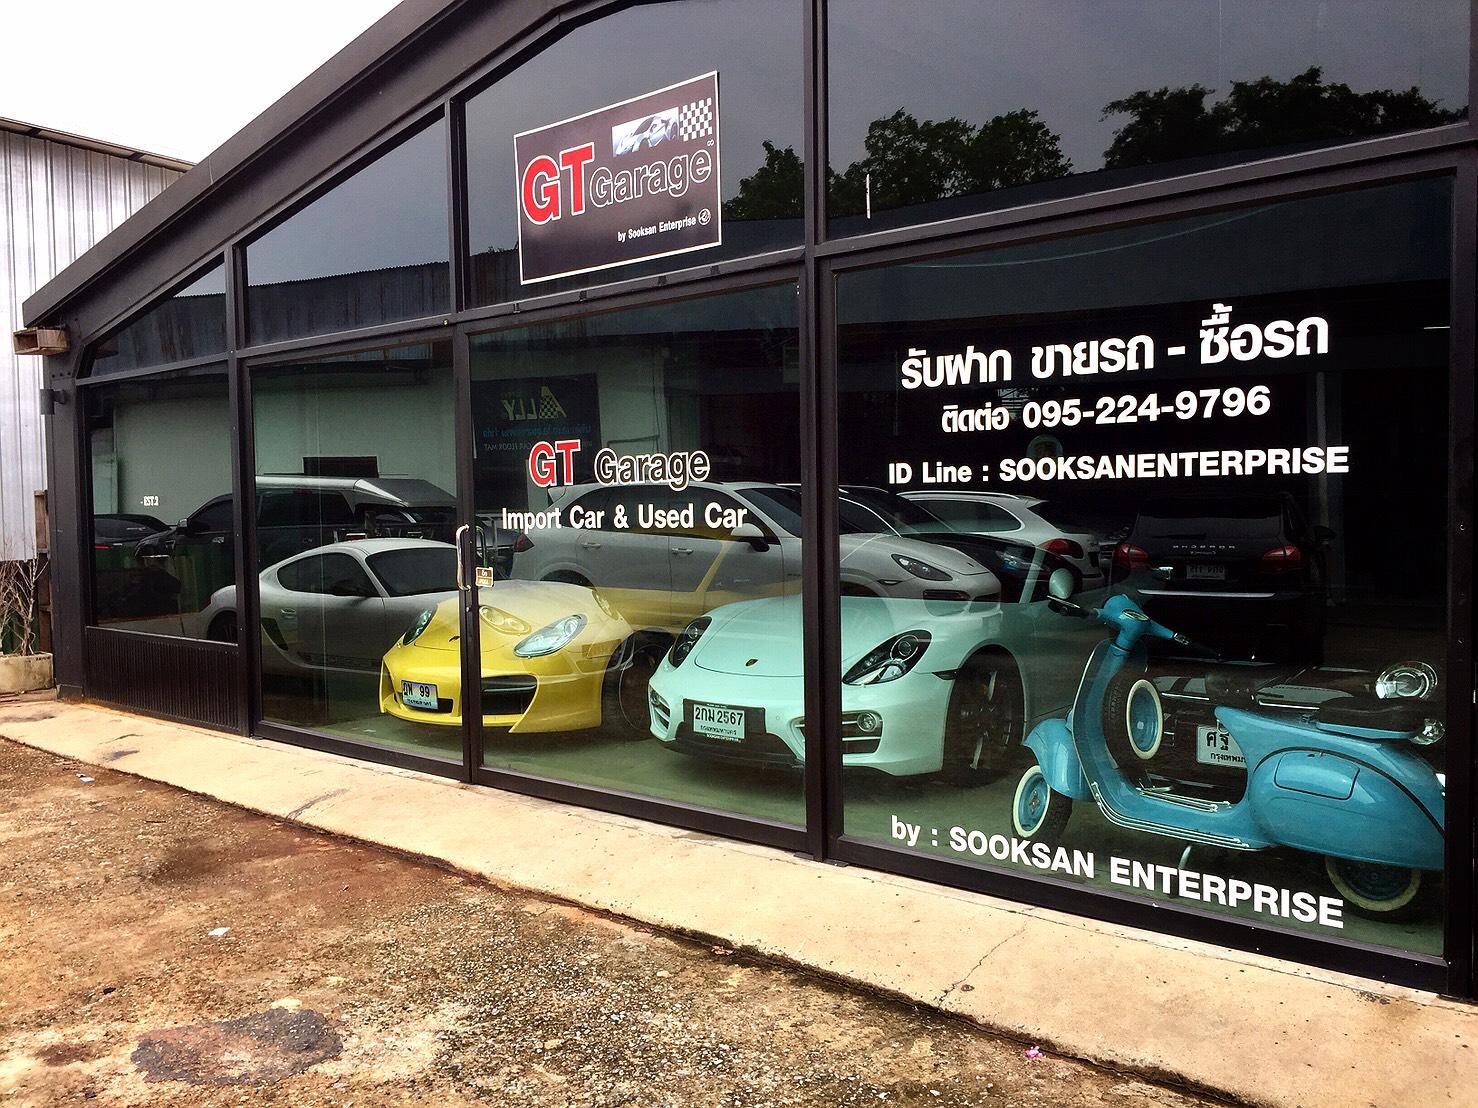 GT  Garage by Sooksan Enterpries